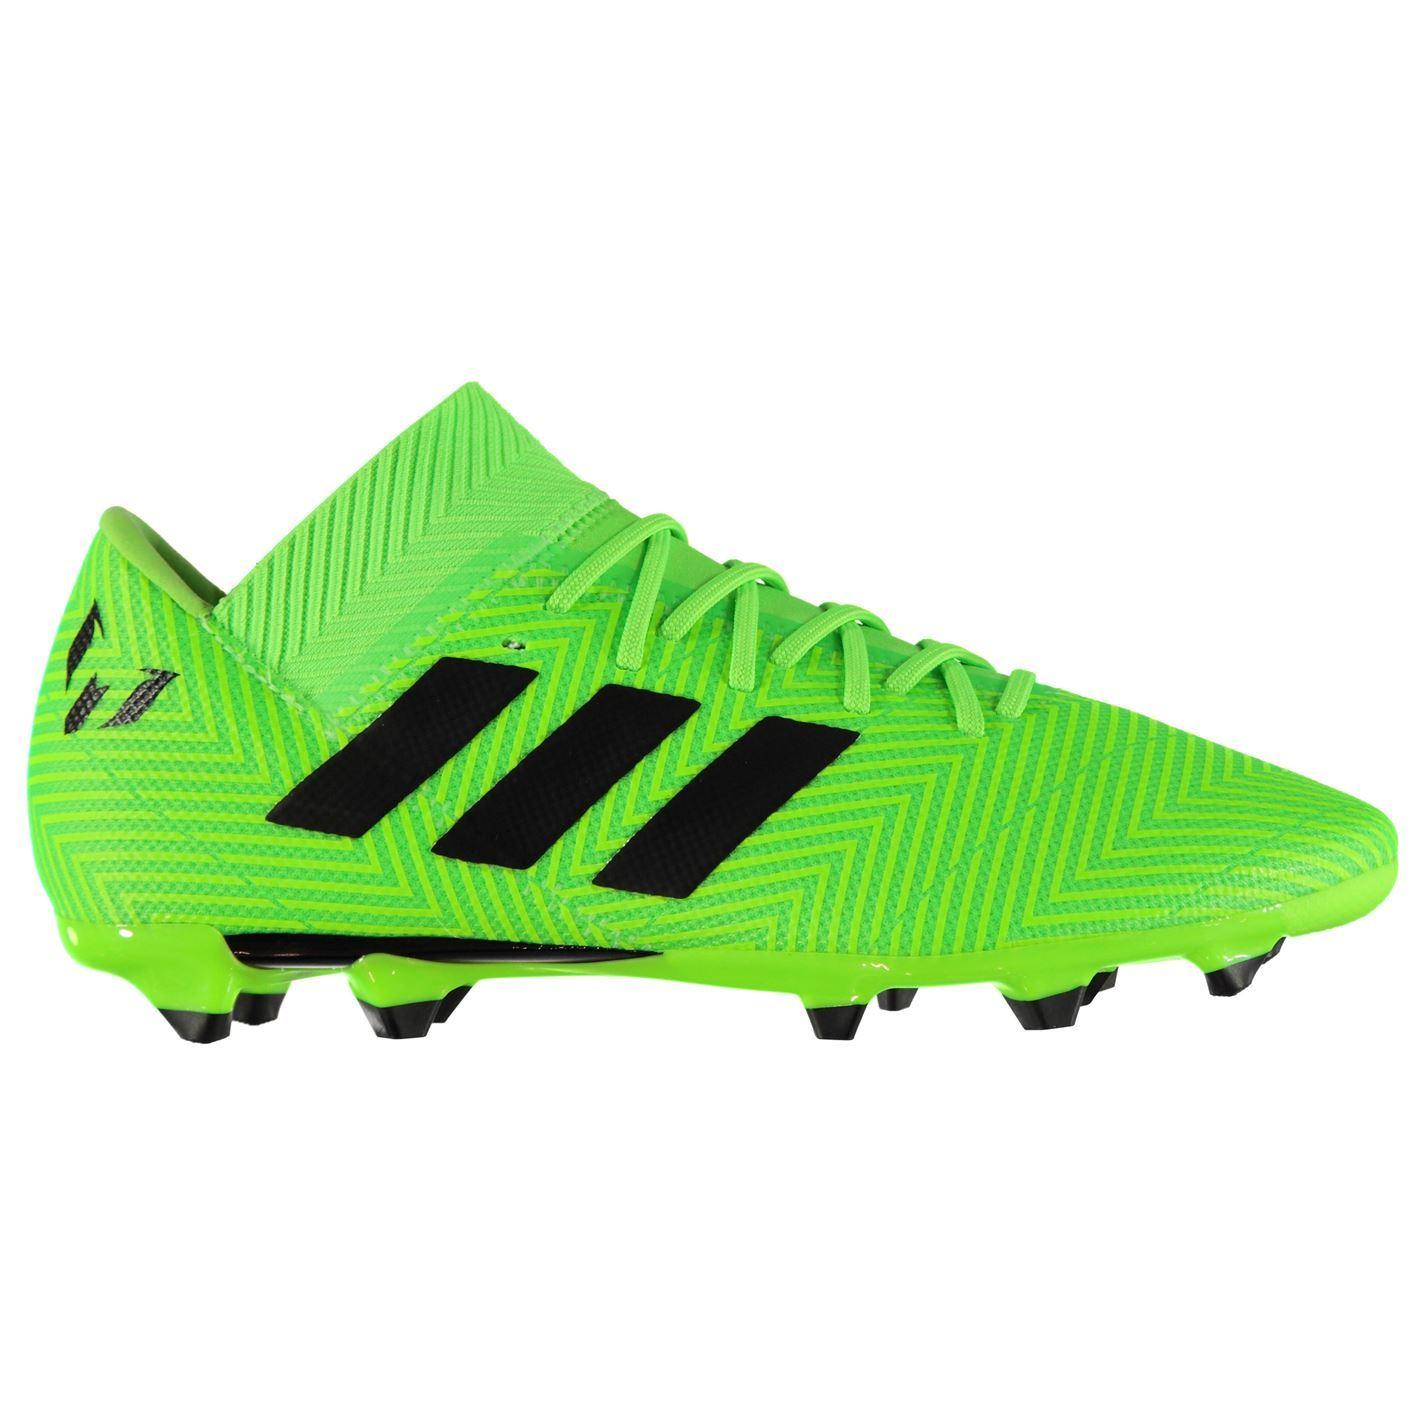 ... adidas Nemeziz Messi 18.3 Firm Ground Football Boots Mens Green Soccer  Cleats ... eb8c03a0fa5d2